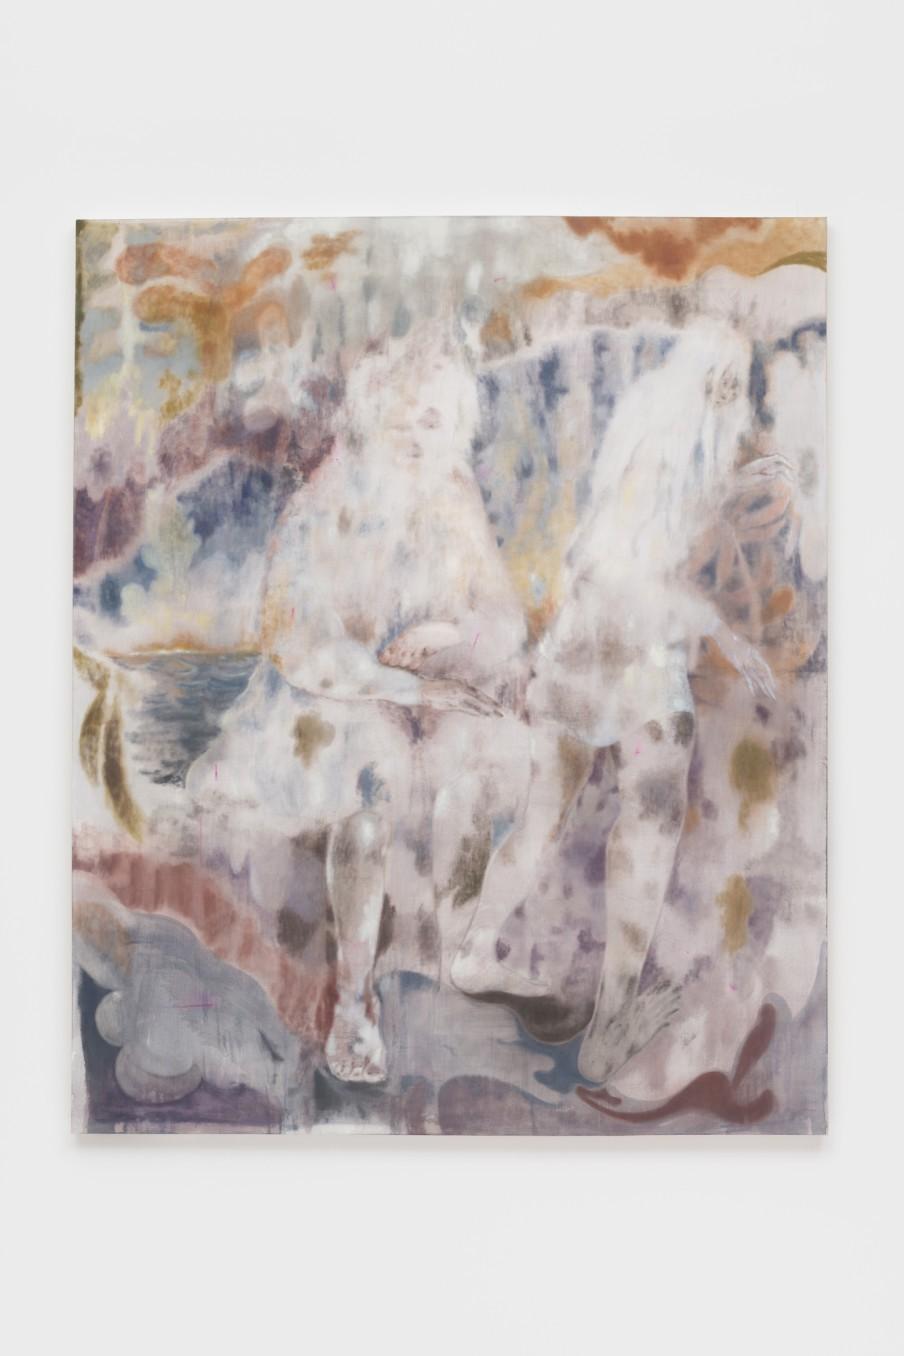 Maja Ruznic Trace of the Father, 2019 Oil on canvas 203.2 x 165.1 cm 80 x 65 in Inquire